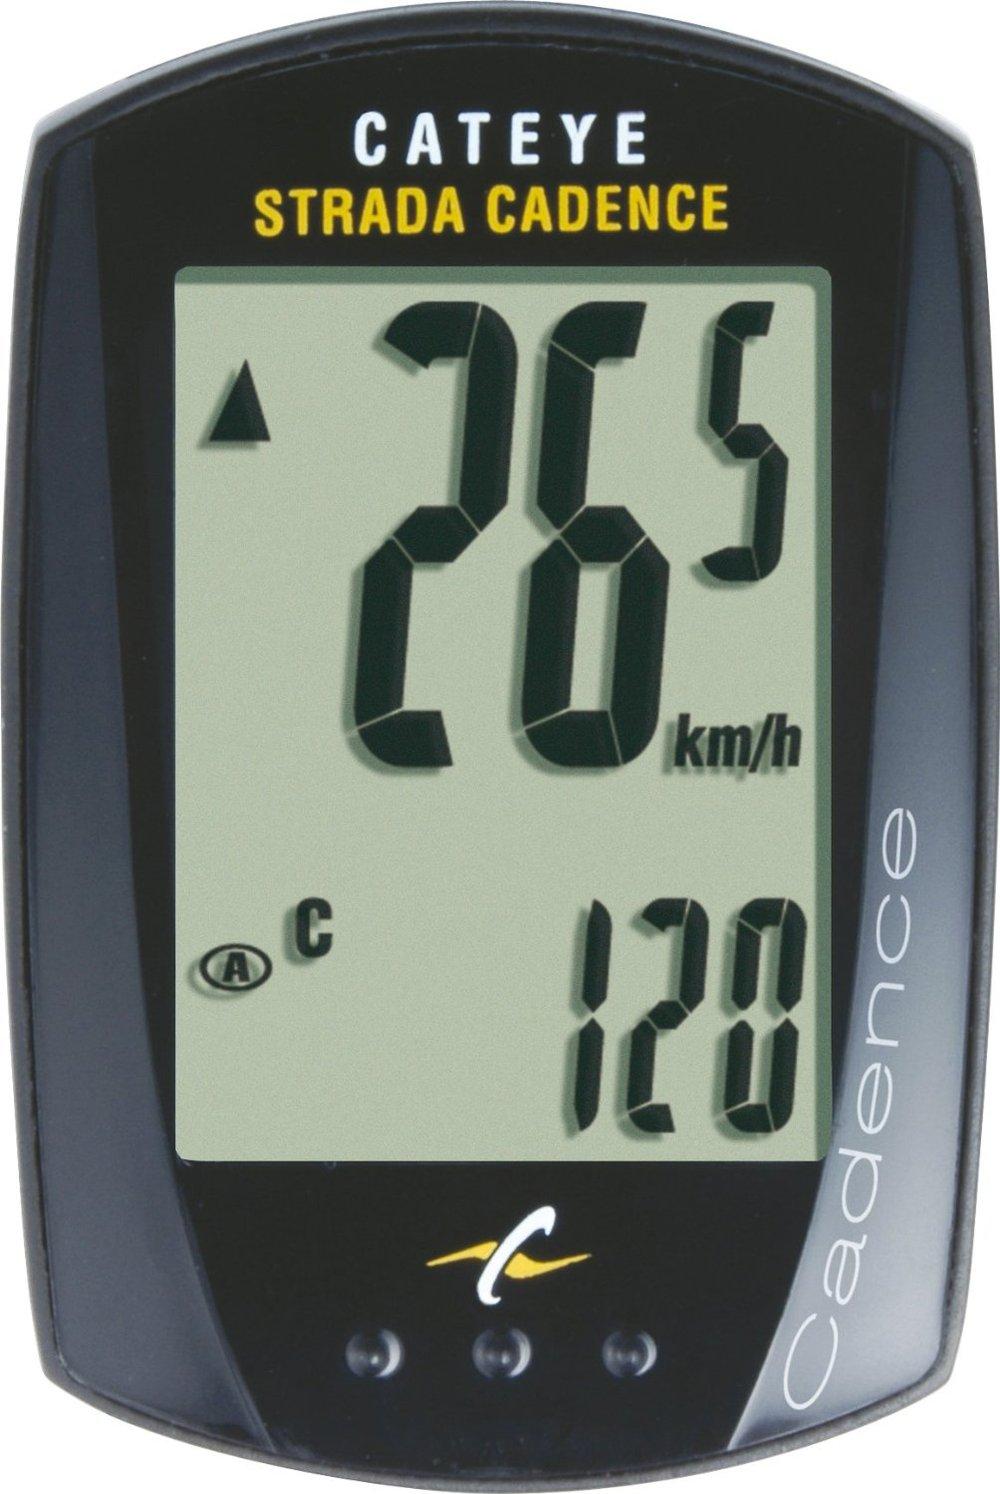 CatEye Strada Cadence vélo ordinateur CC-RD200